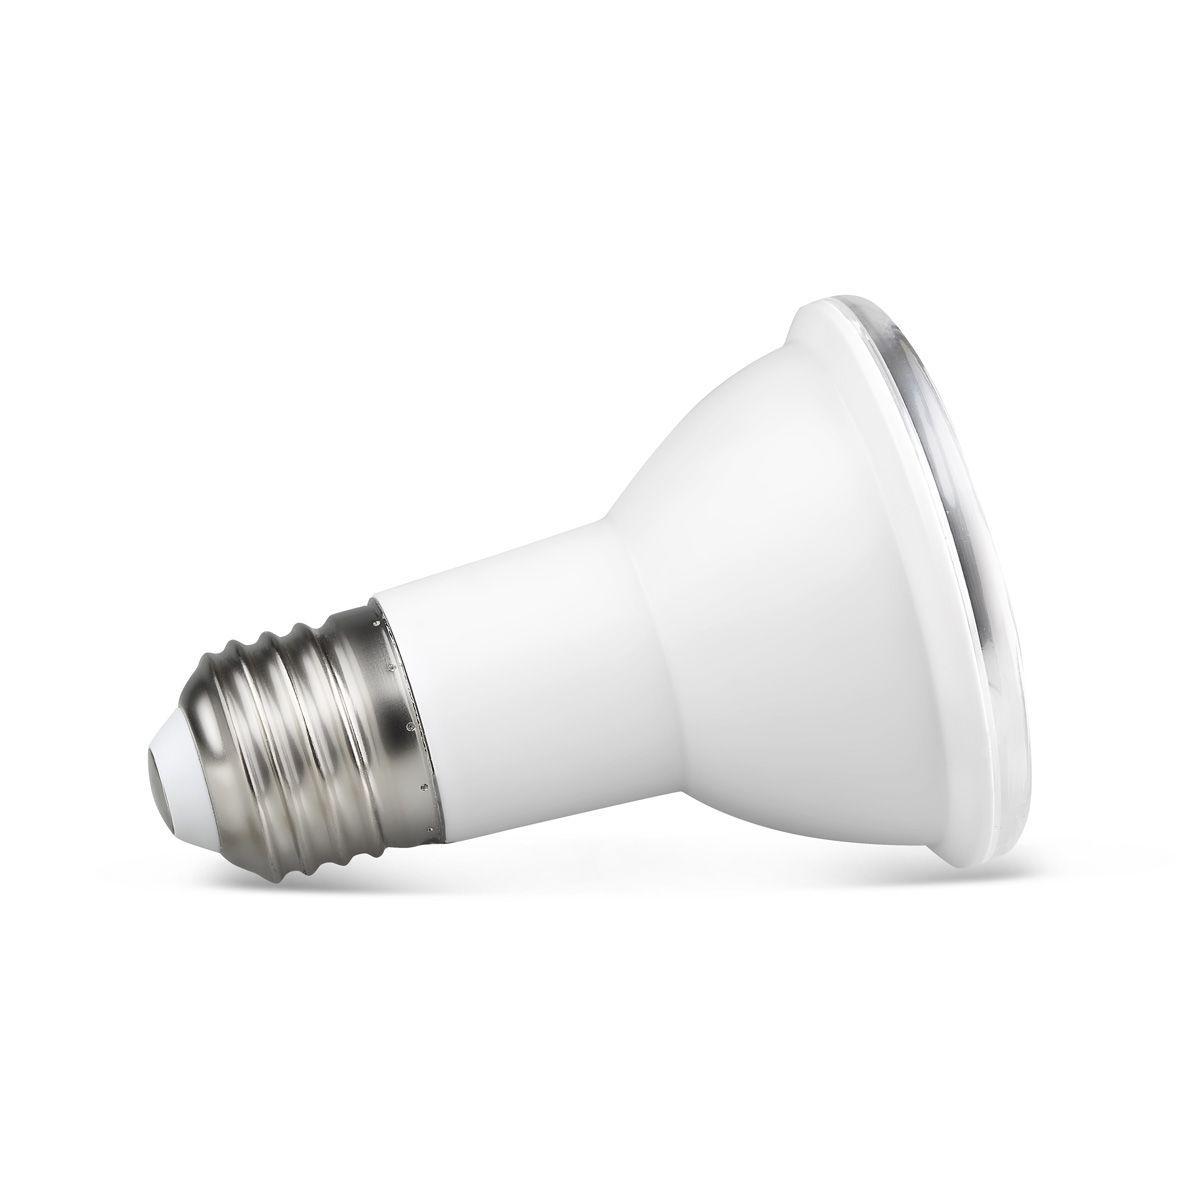 Kit 20x Spot Embutir Par20 Preto + Lâmpada LED 7W 4000K